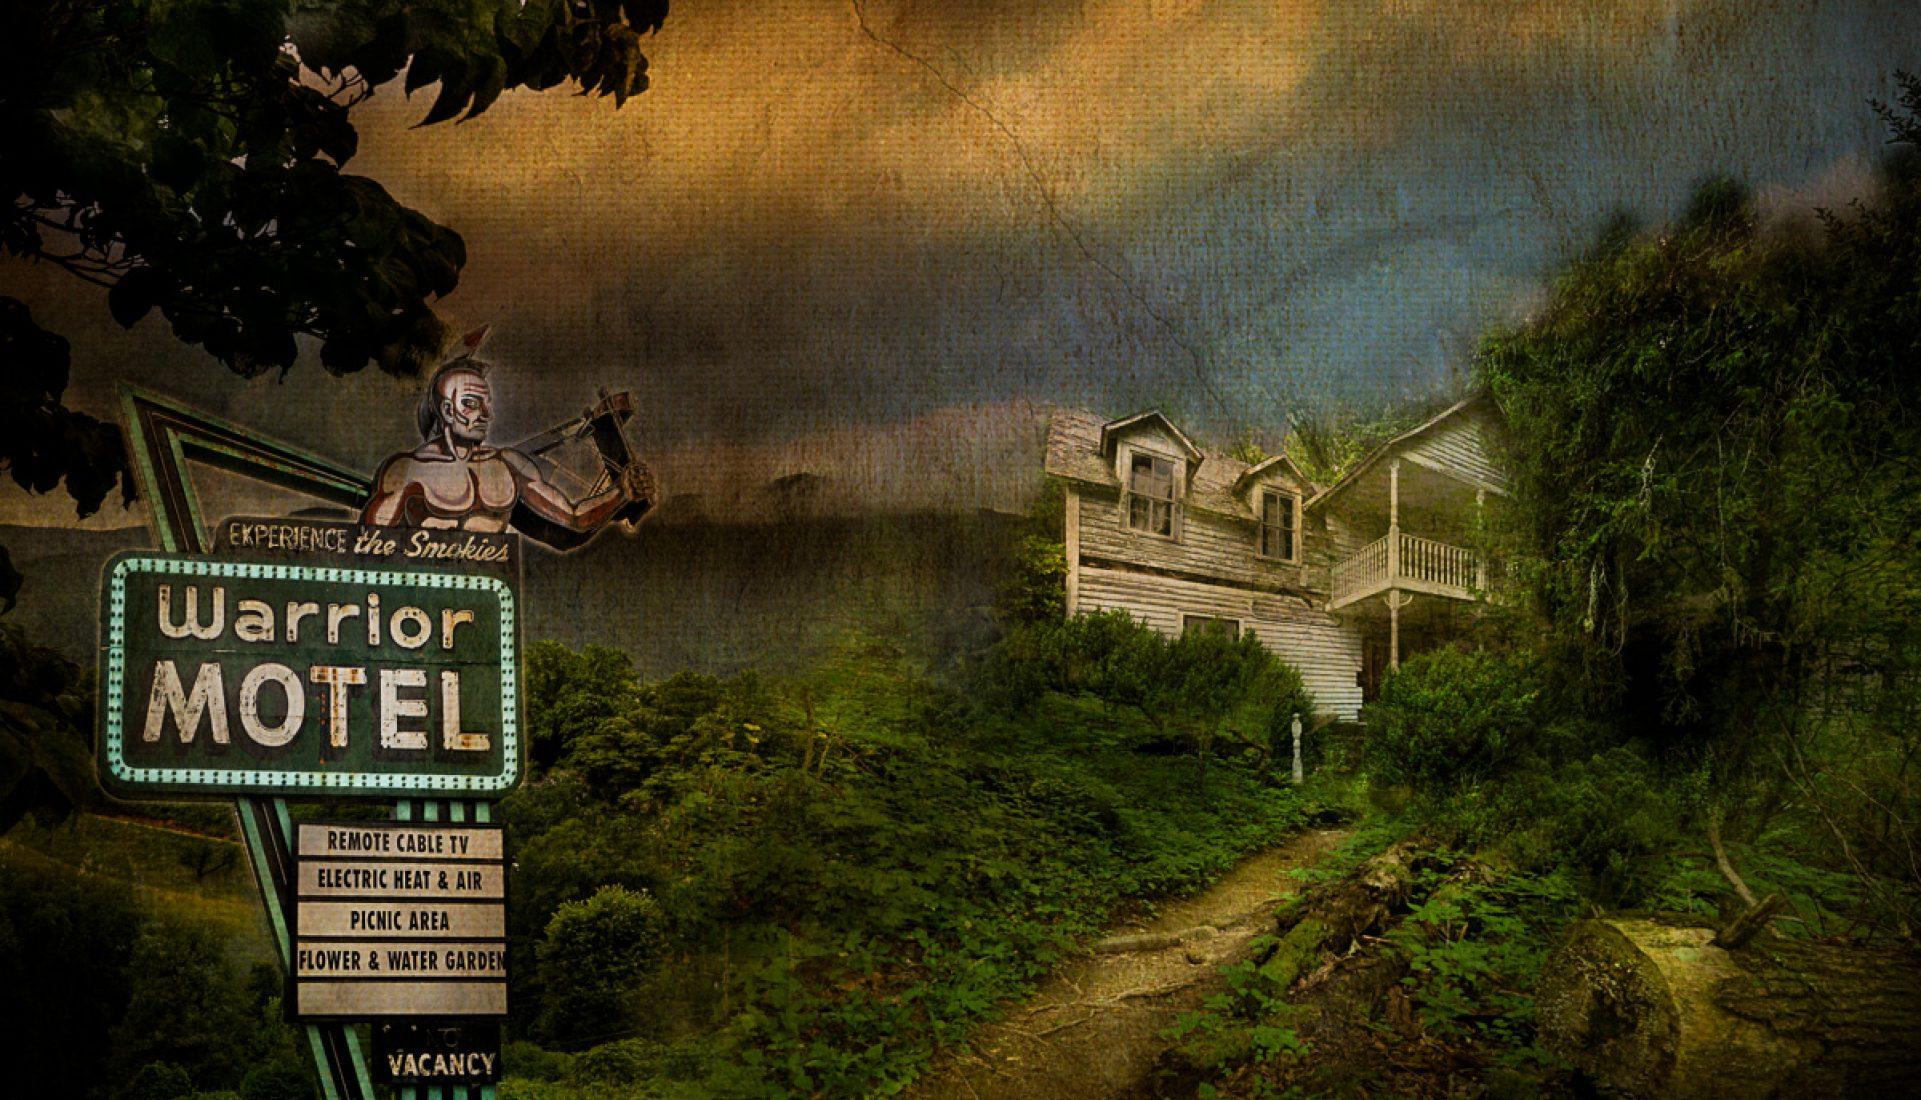 The Warrior Motel